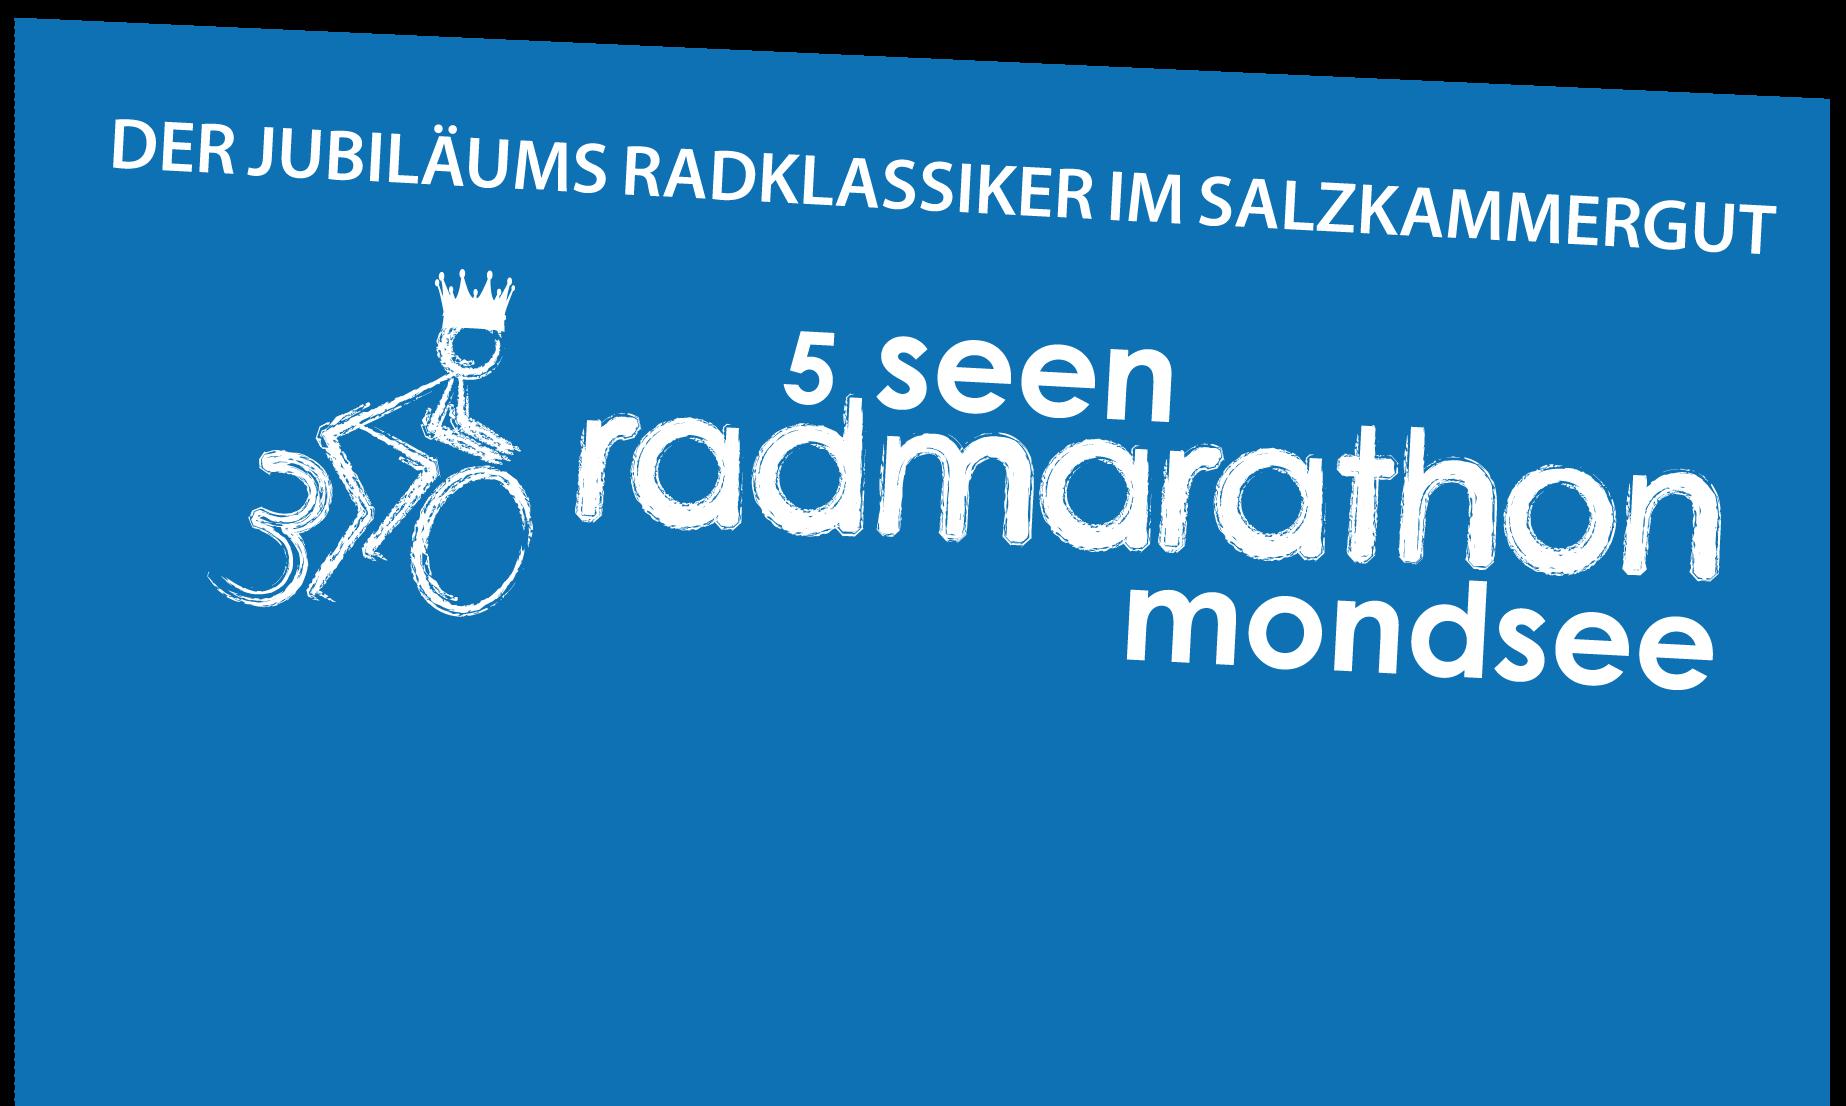 Mondseer 5-Seen Marathon